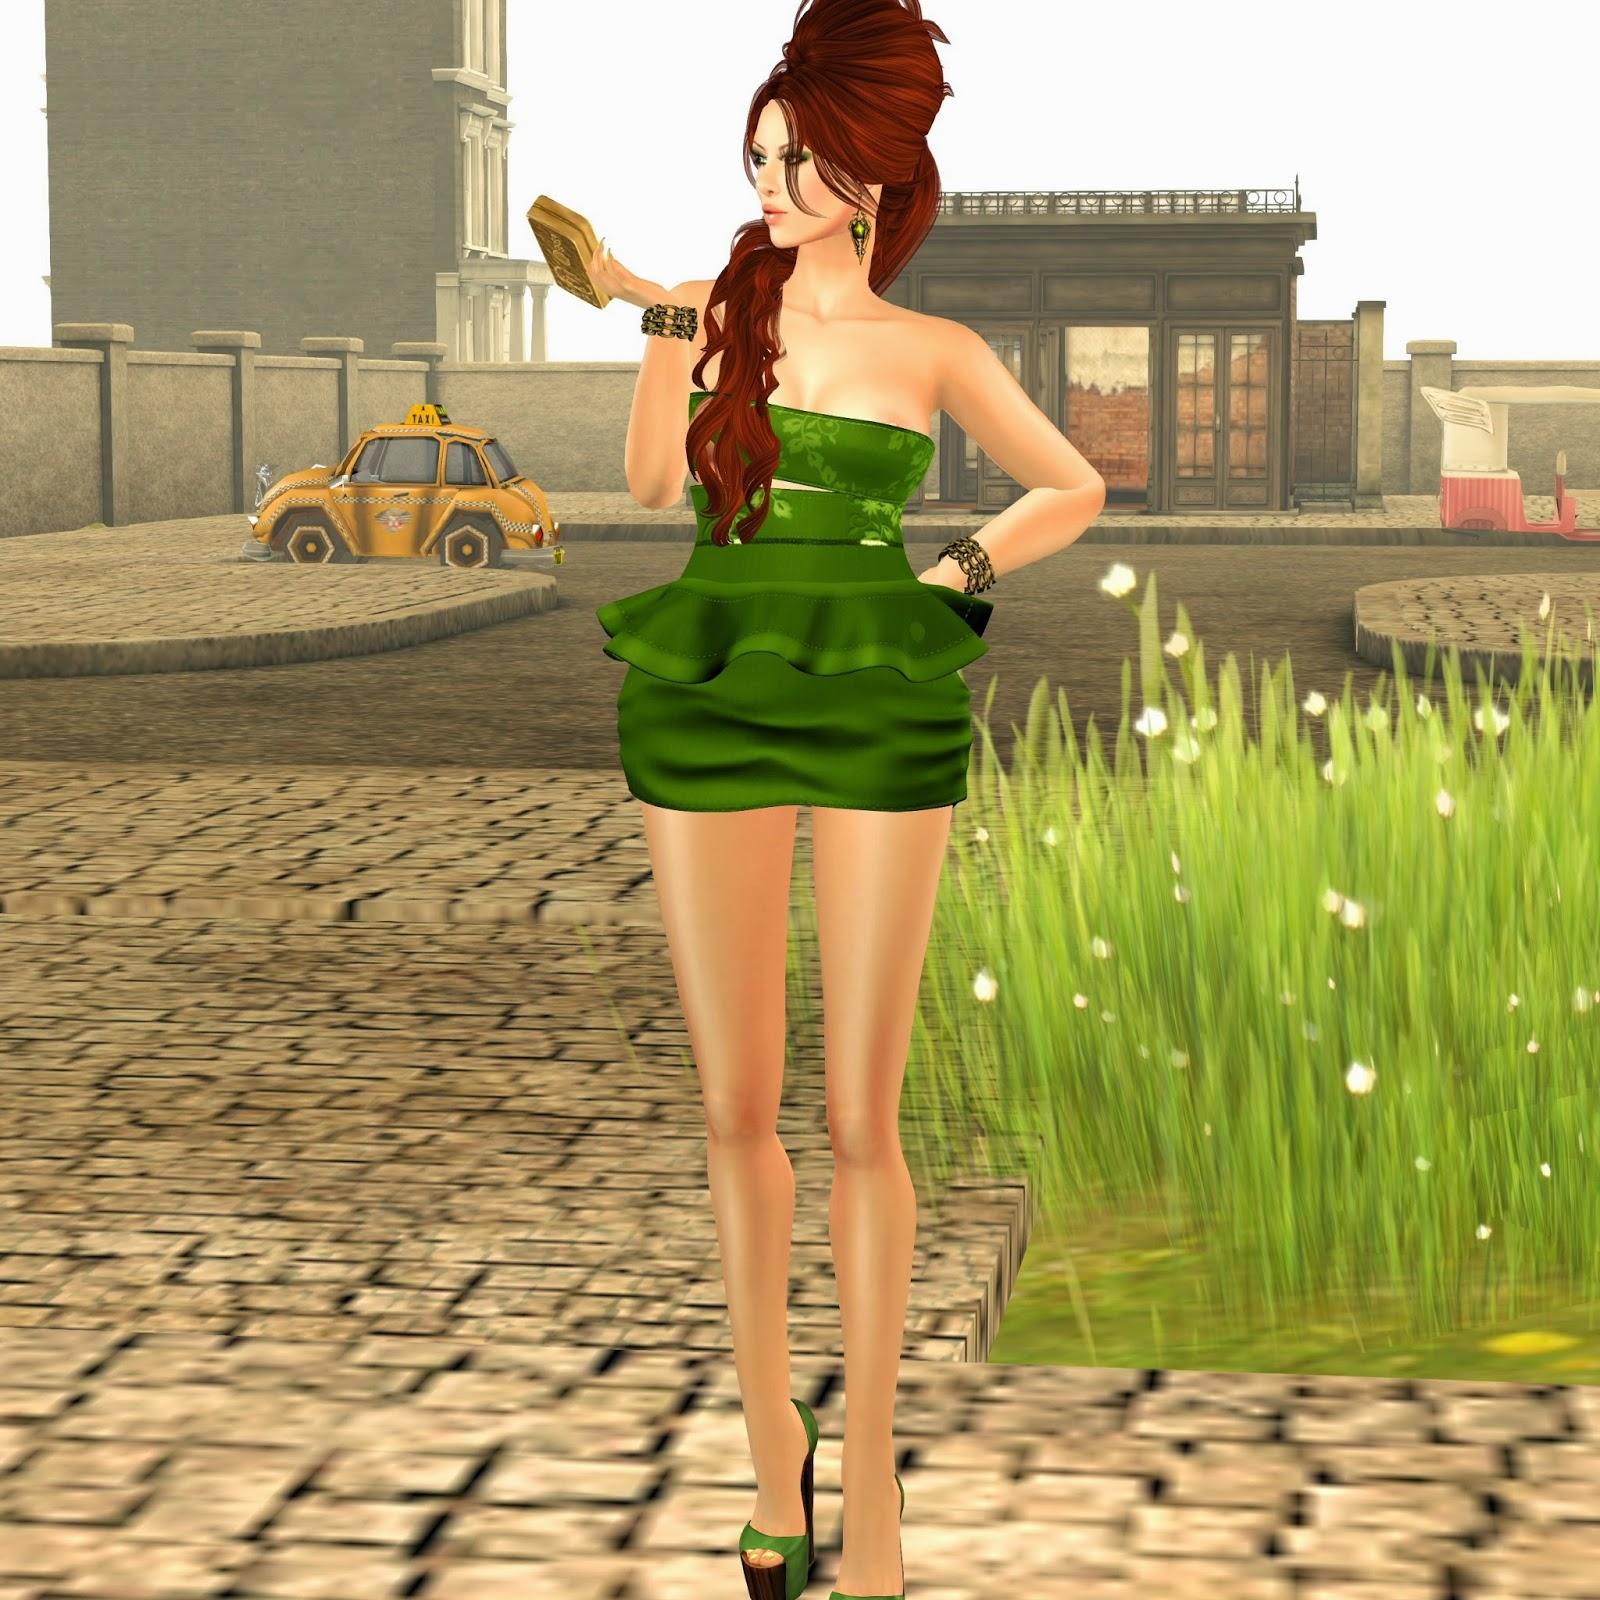 miss canning simone dress,zoz spring flowers